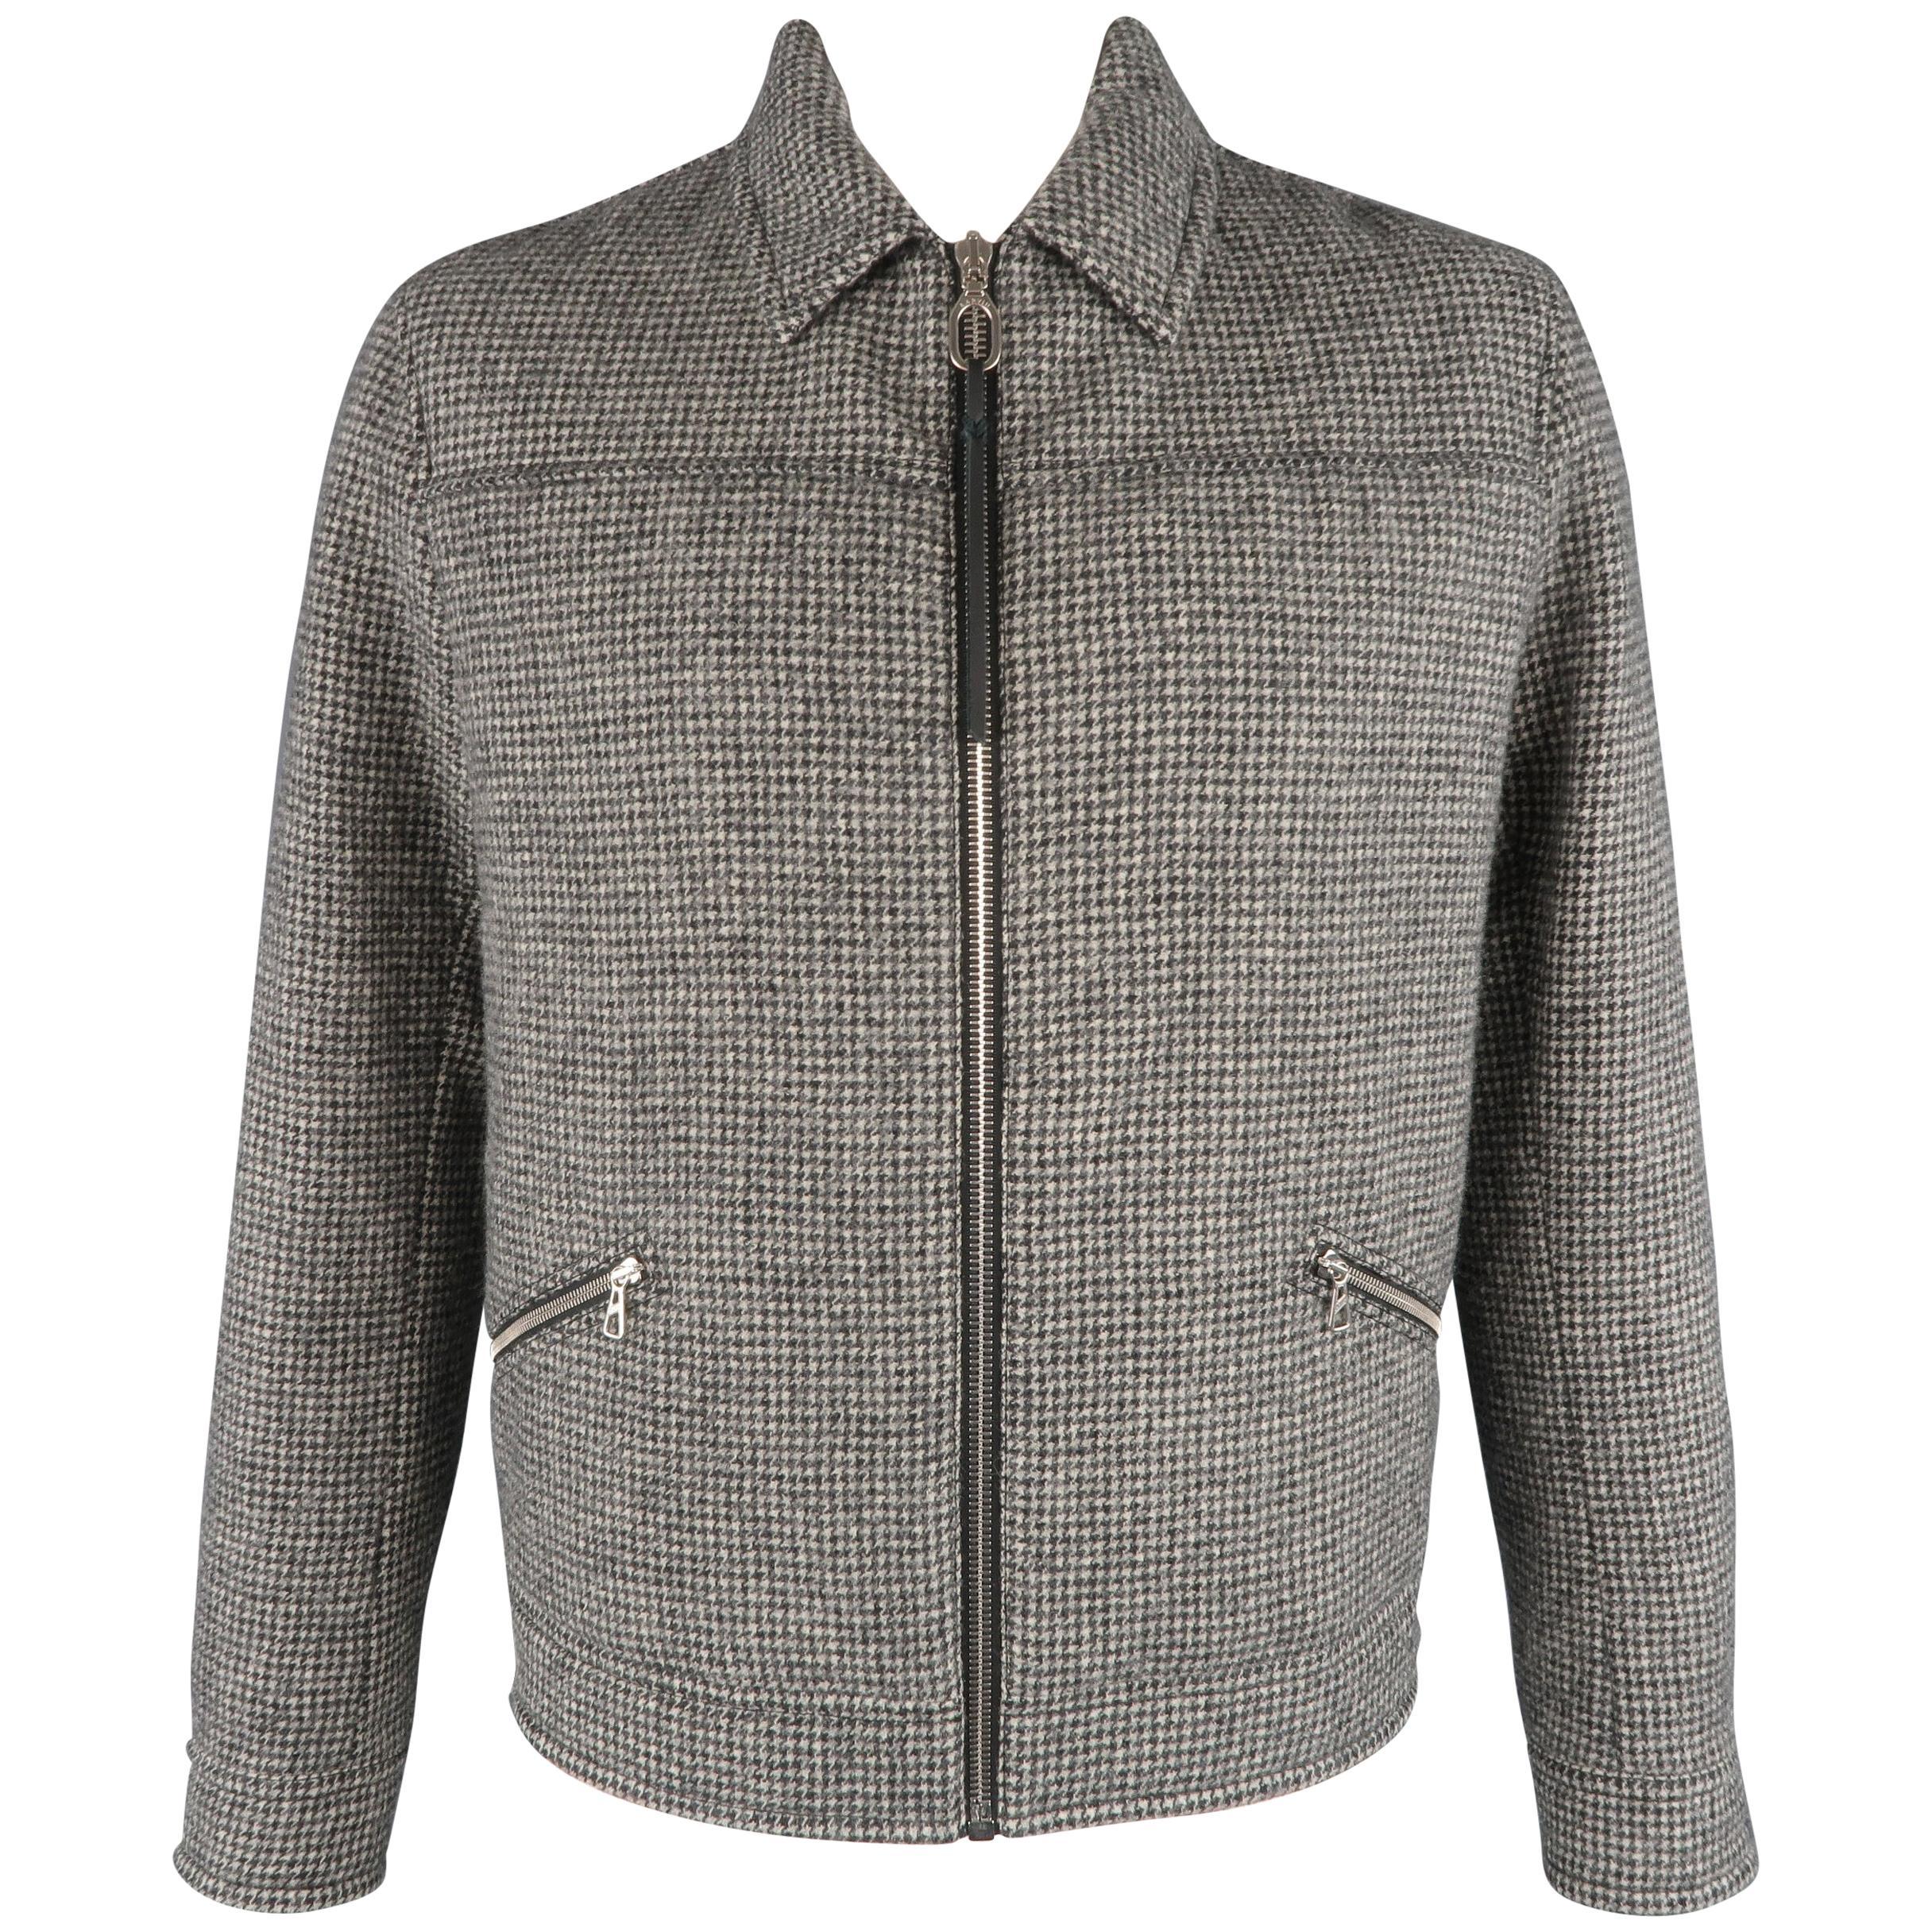 44 Black Beige Zip Blouson Houndstooth amp; For Lanvin Sale Jacket Wool aqdtTaw